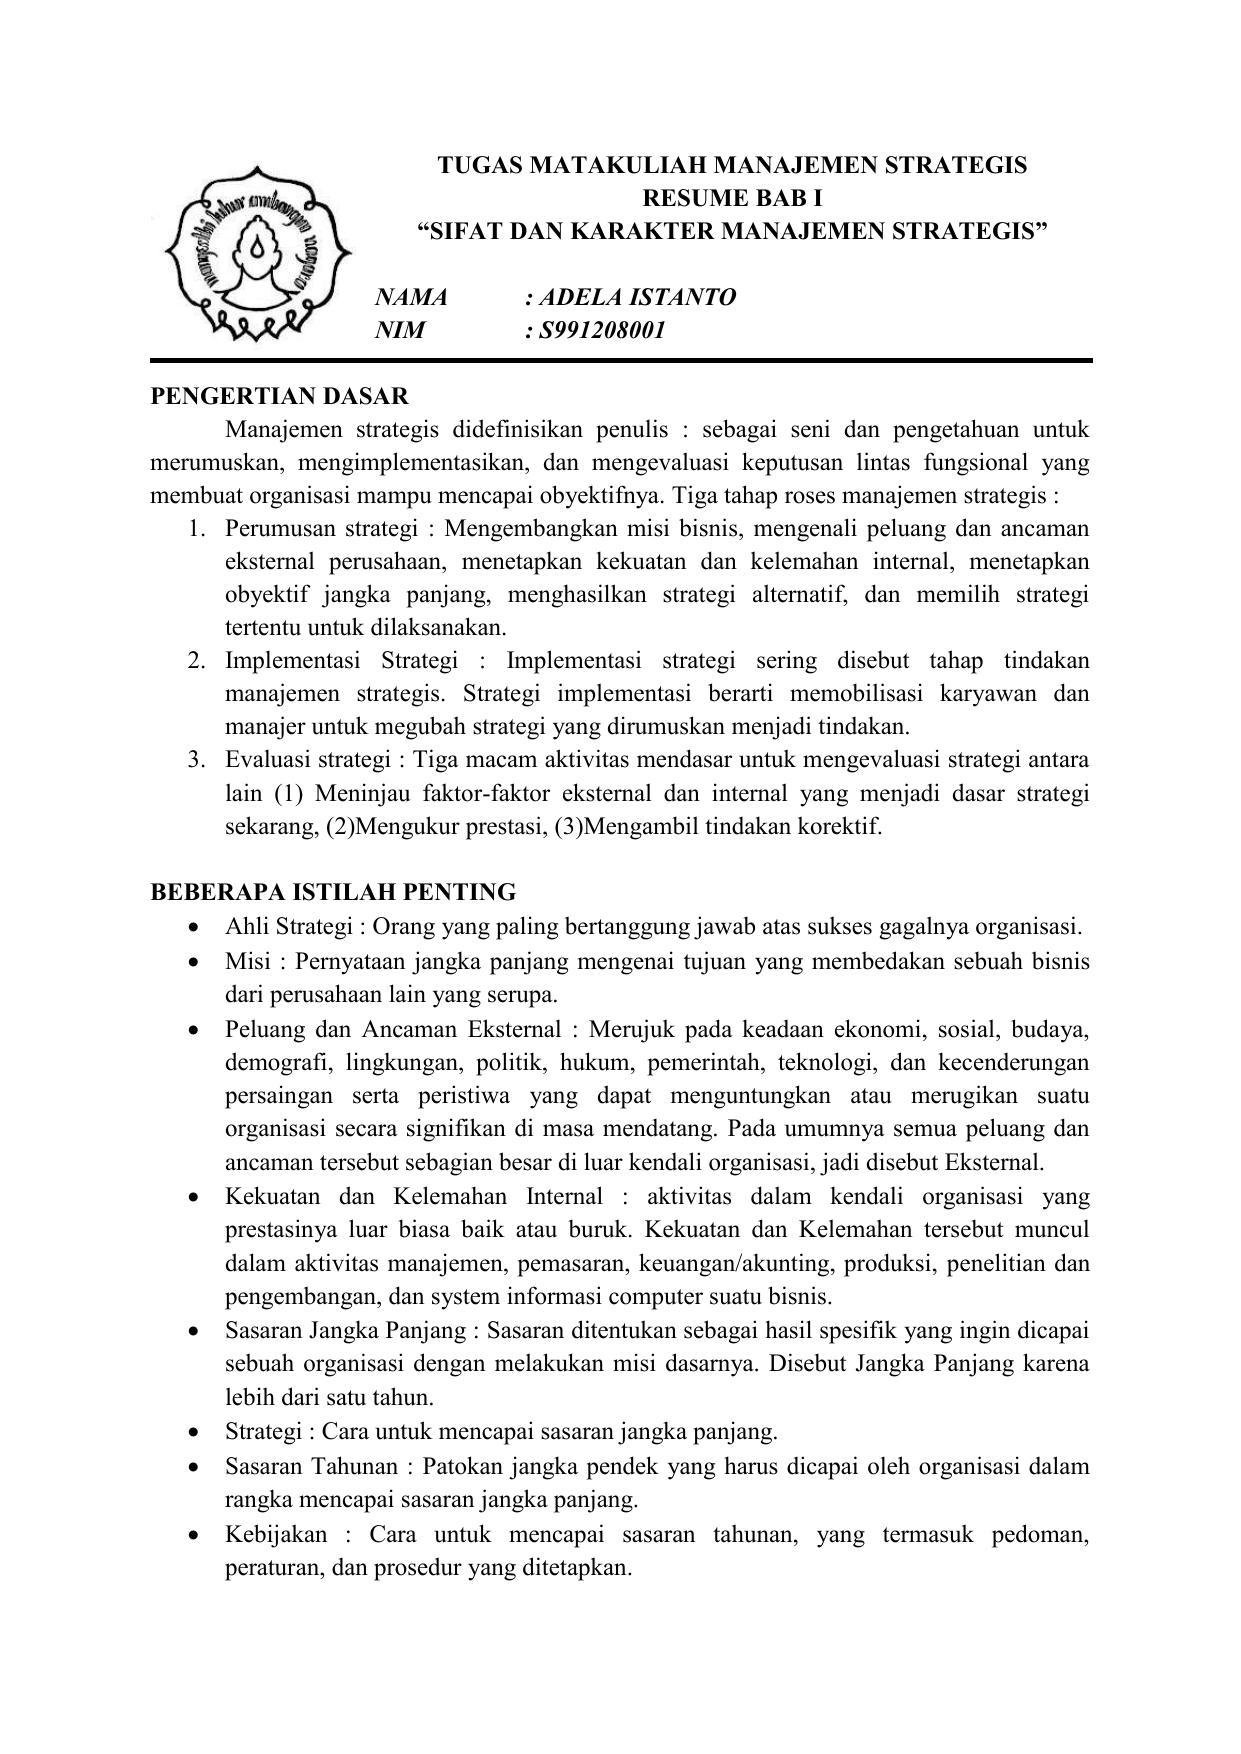 Tugas Matakuliah Manajemen Strategis Resume Bab I